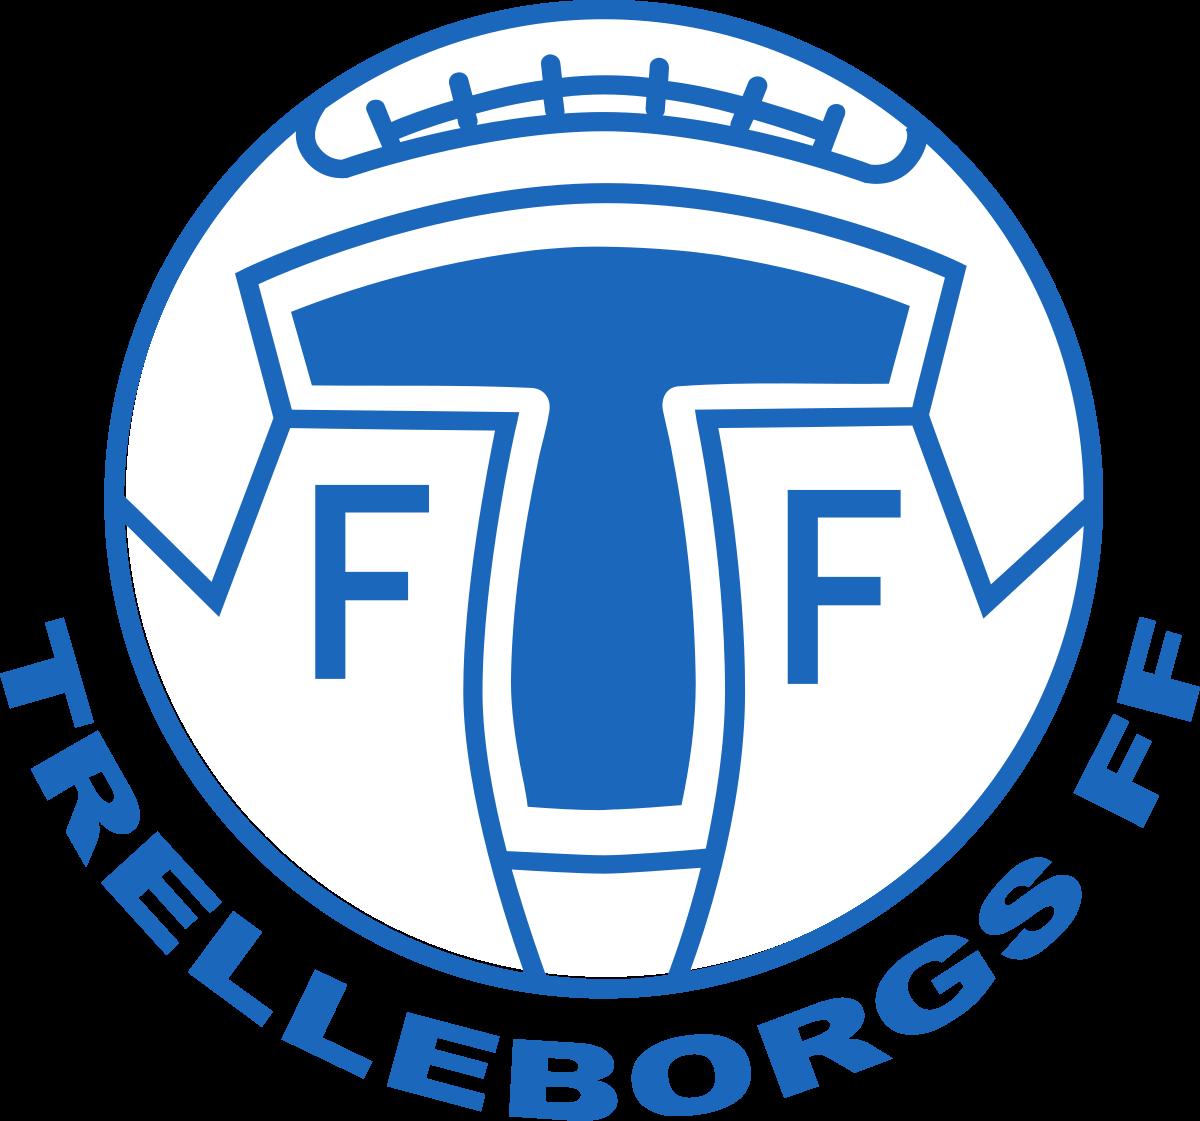 Trelleborg U-21 logo